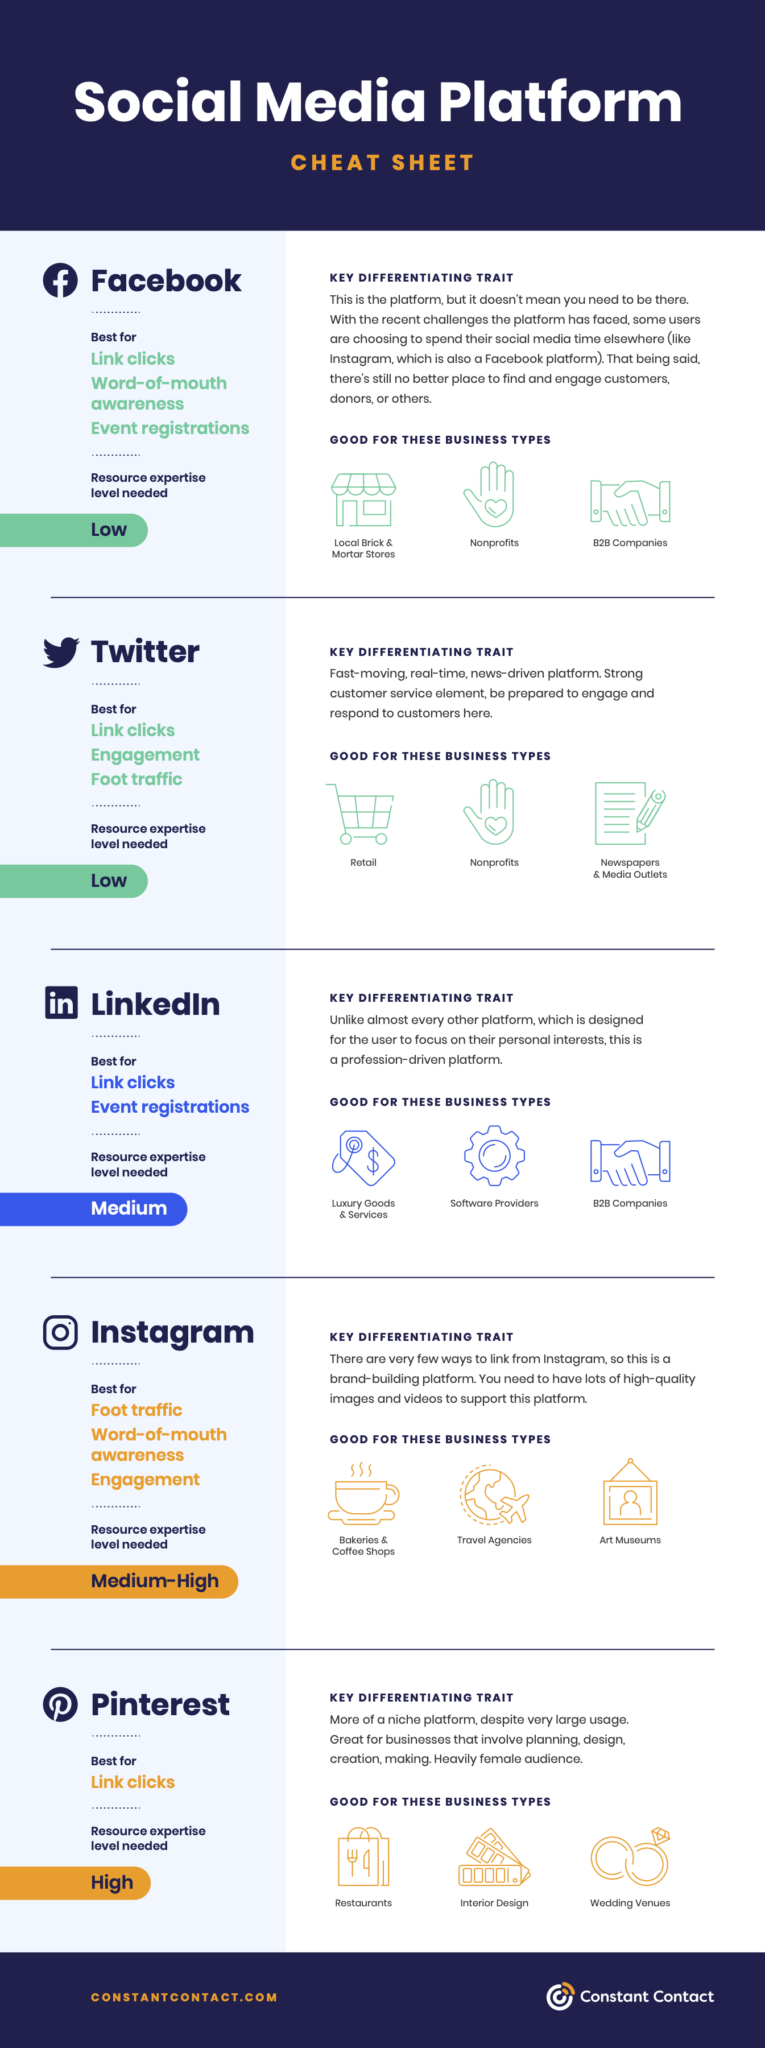 Social platform cheat sheet